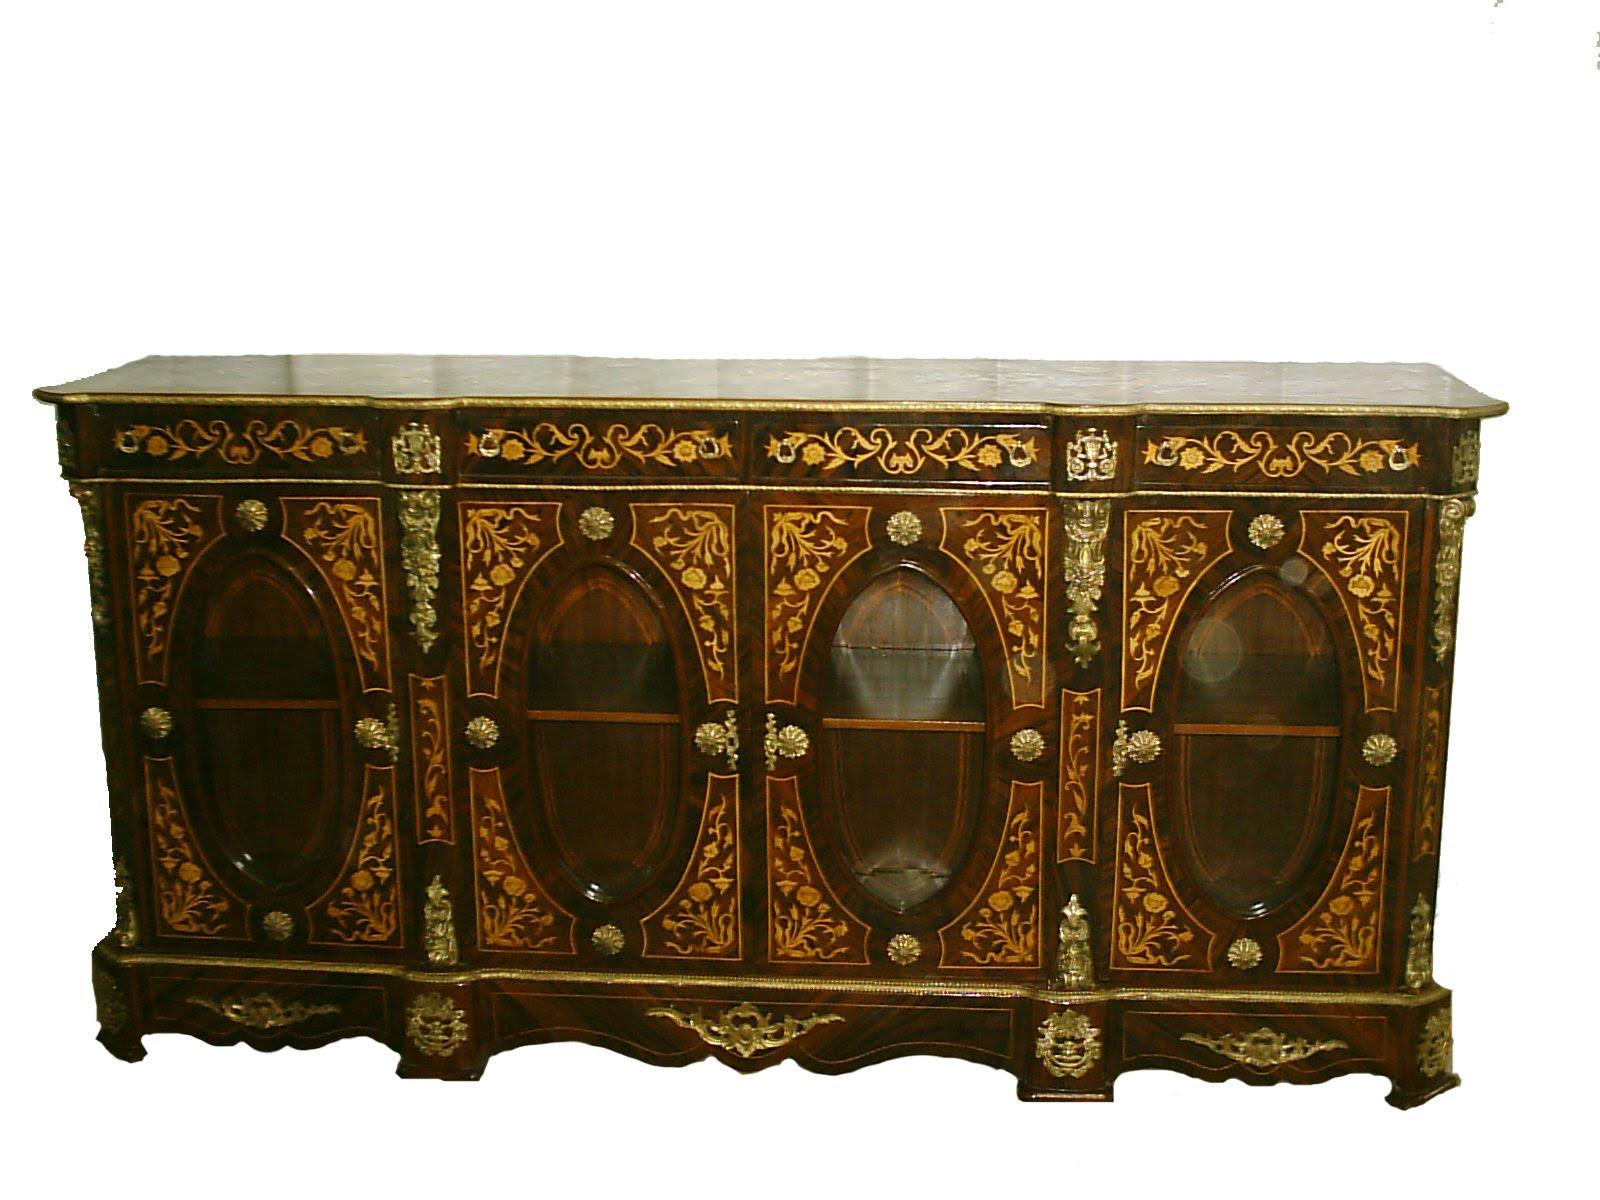 Antique furniture reproductions antique furniture reproductions - Italian Antique Neoclassical Marquetry Cabinet